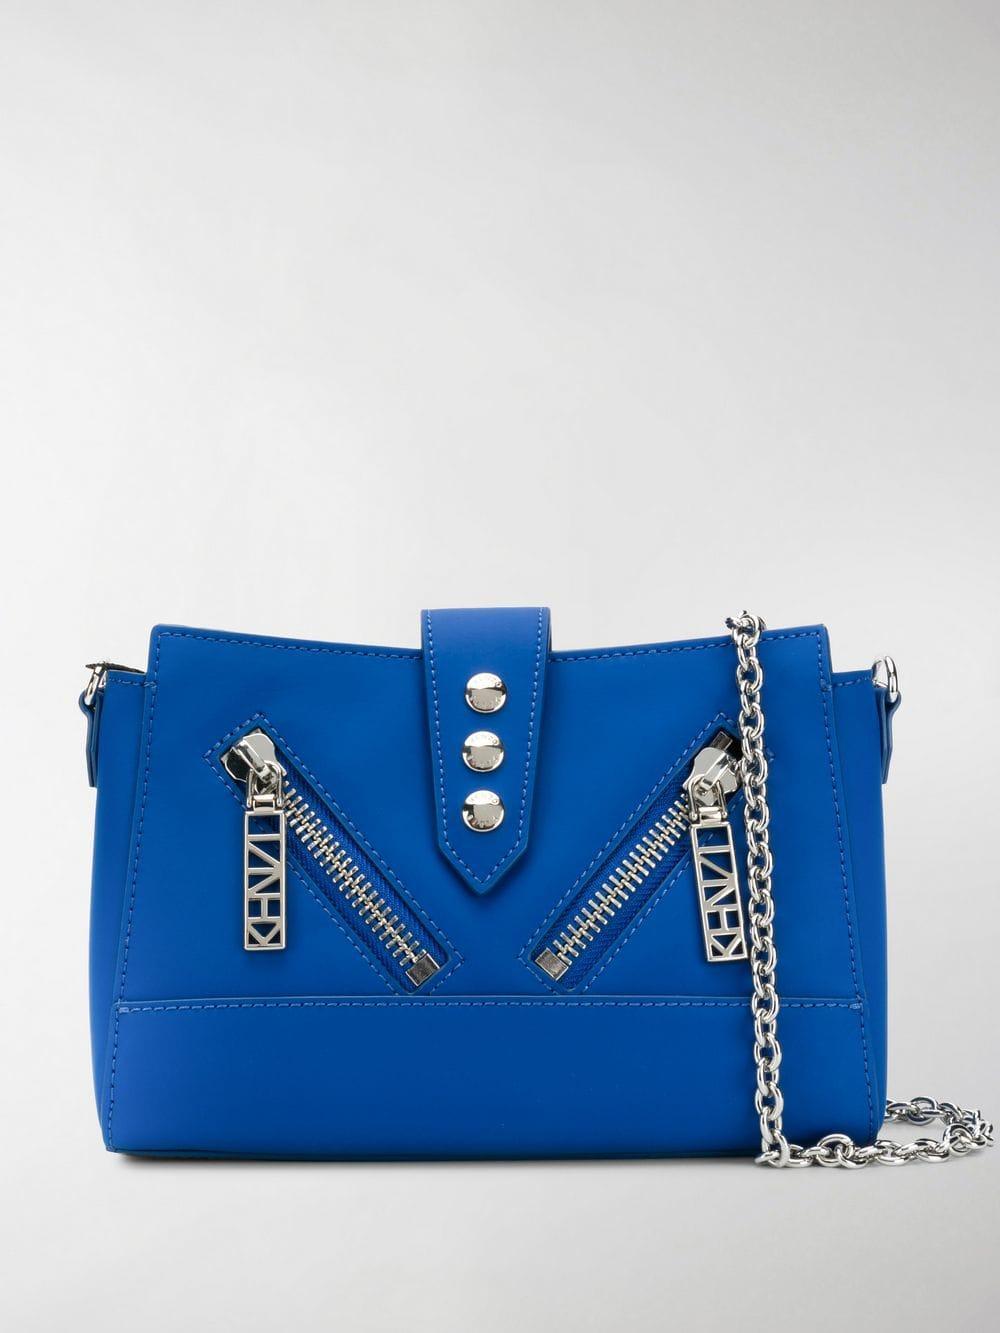 62f23b1e41 KENZO Tiny Kalifornia Crossbody Bag in Blue - Lyst